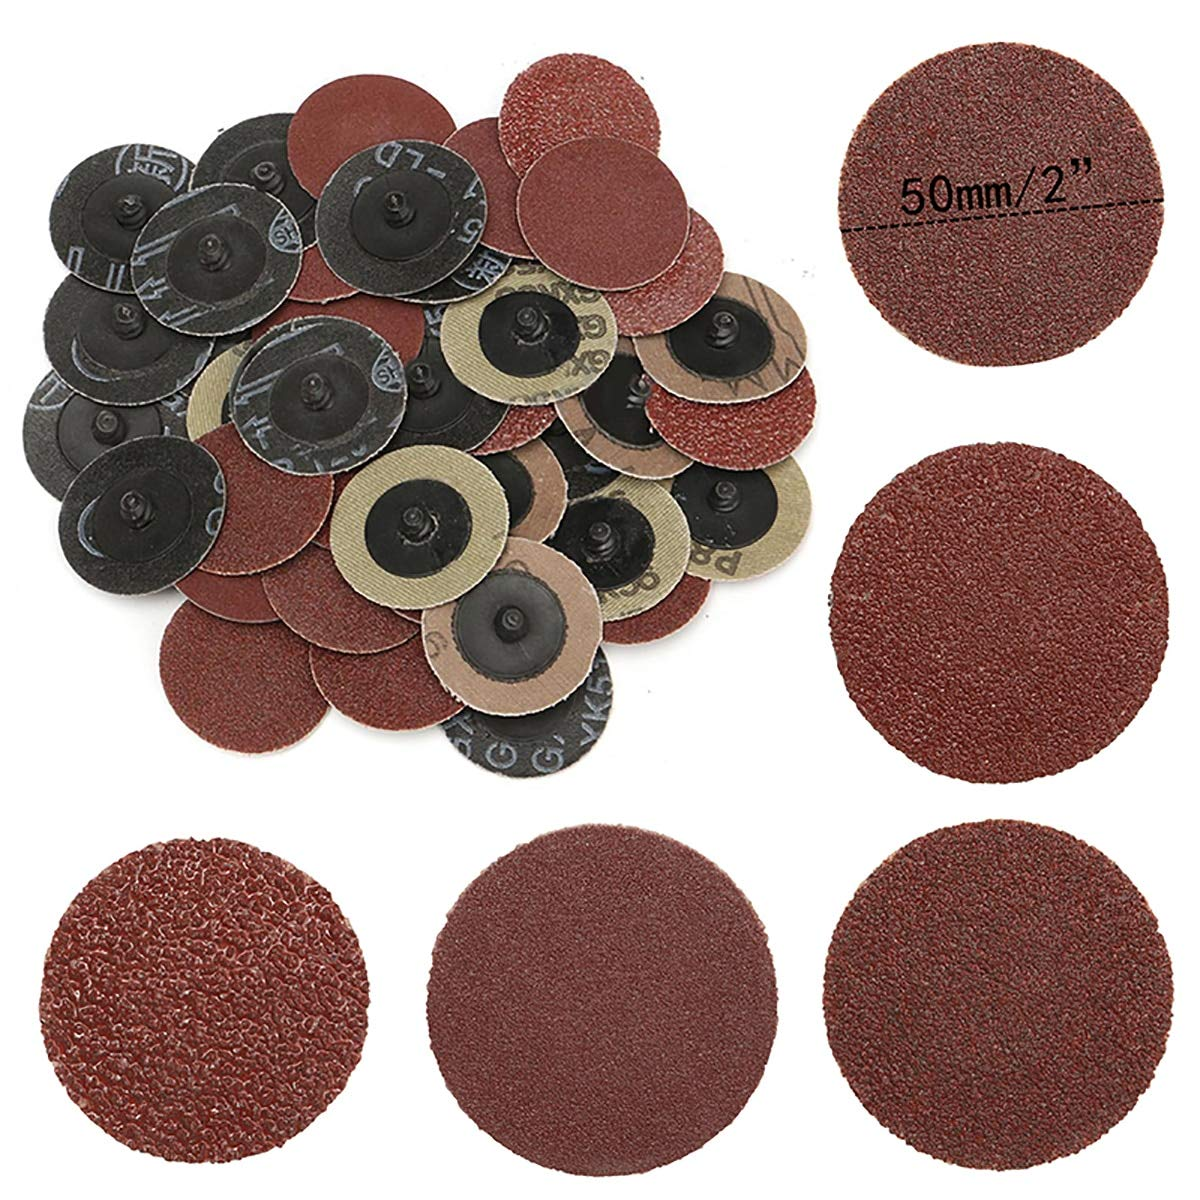 2 Inch 40pcs Hook And Loop 40 80 120 240 Grit Sand Paper Sanding Discs